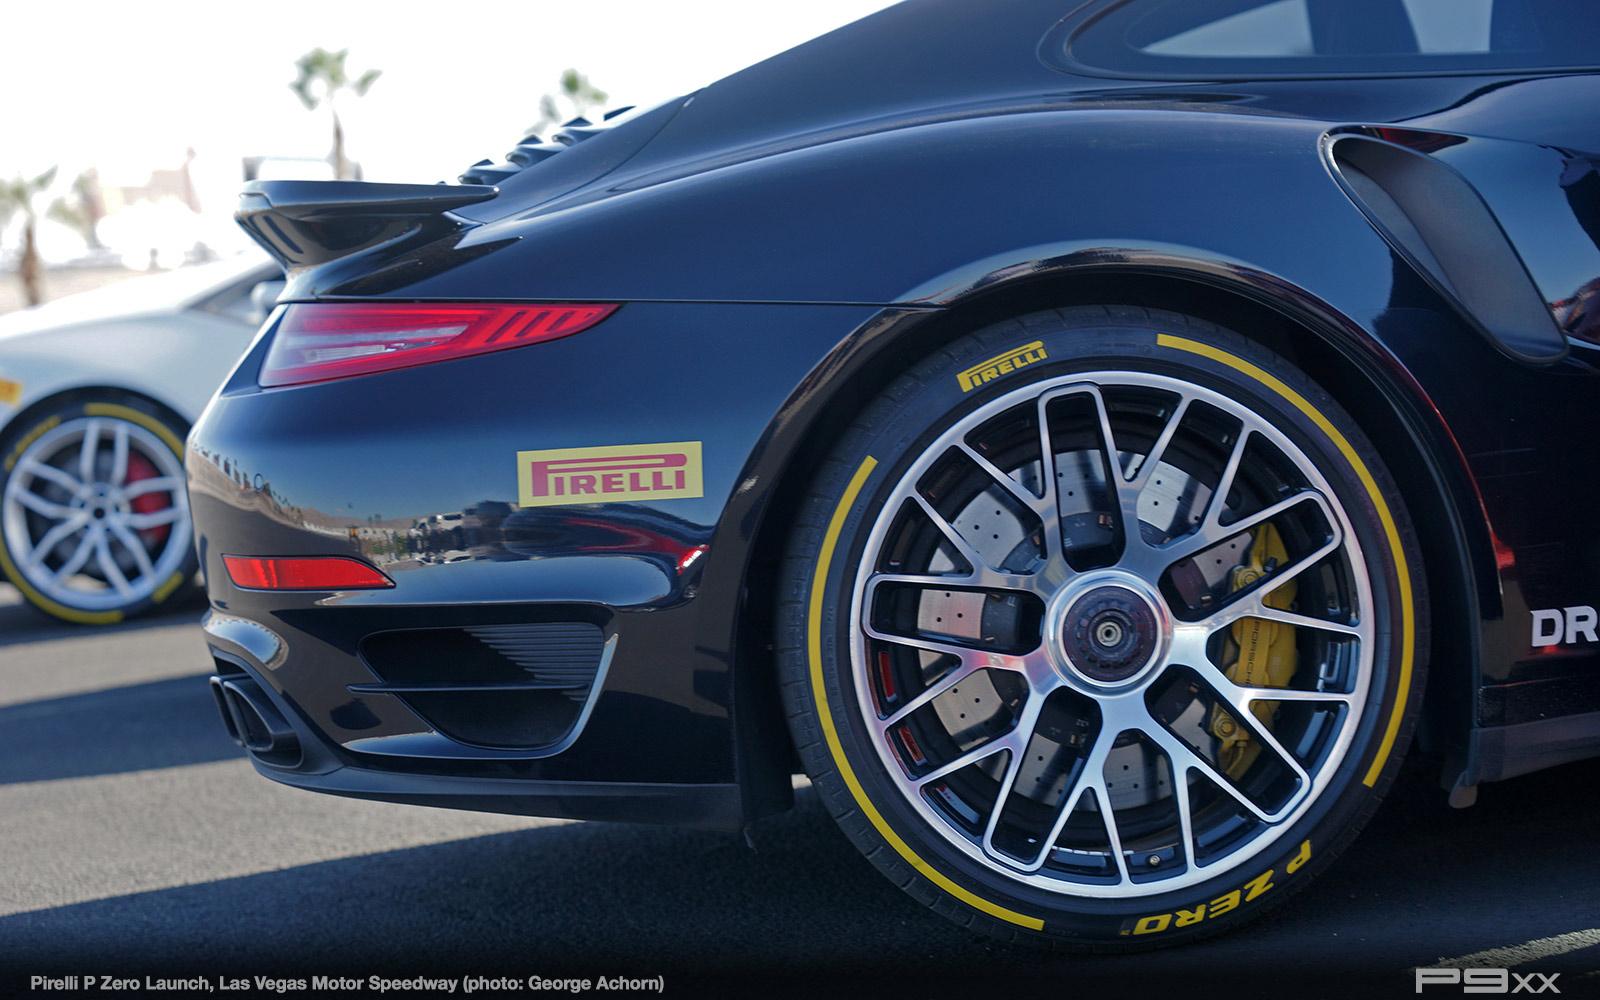 Tech Pirelli Re Sets Bar With New P Zero Lineup P9xx